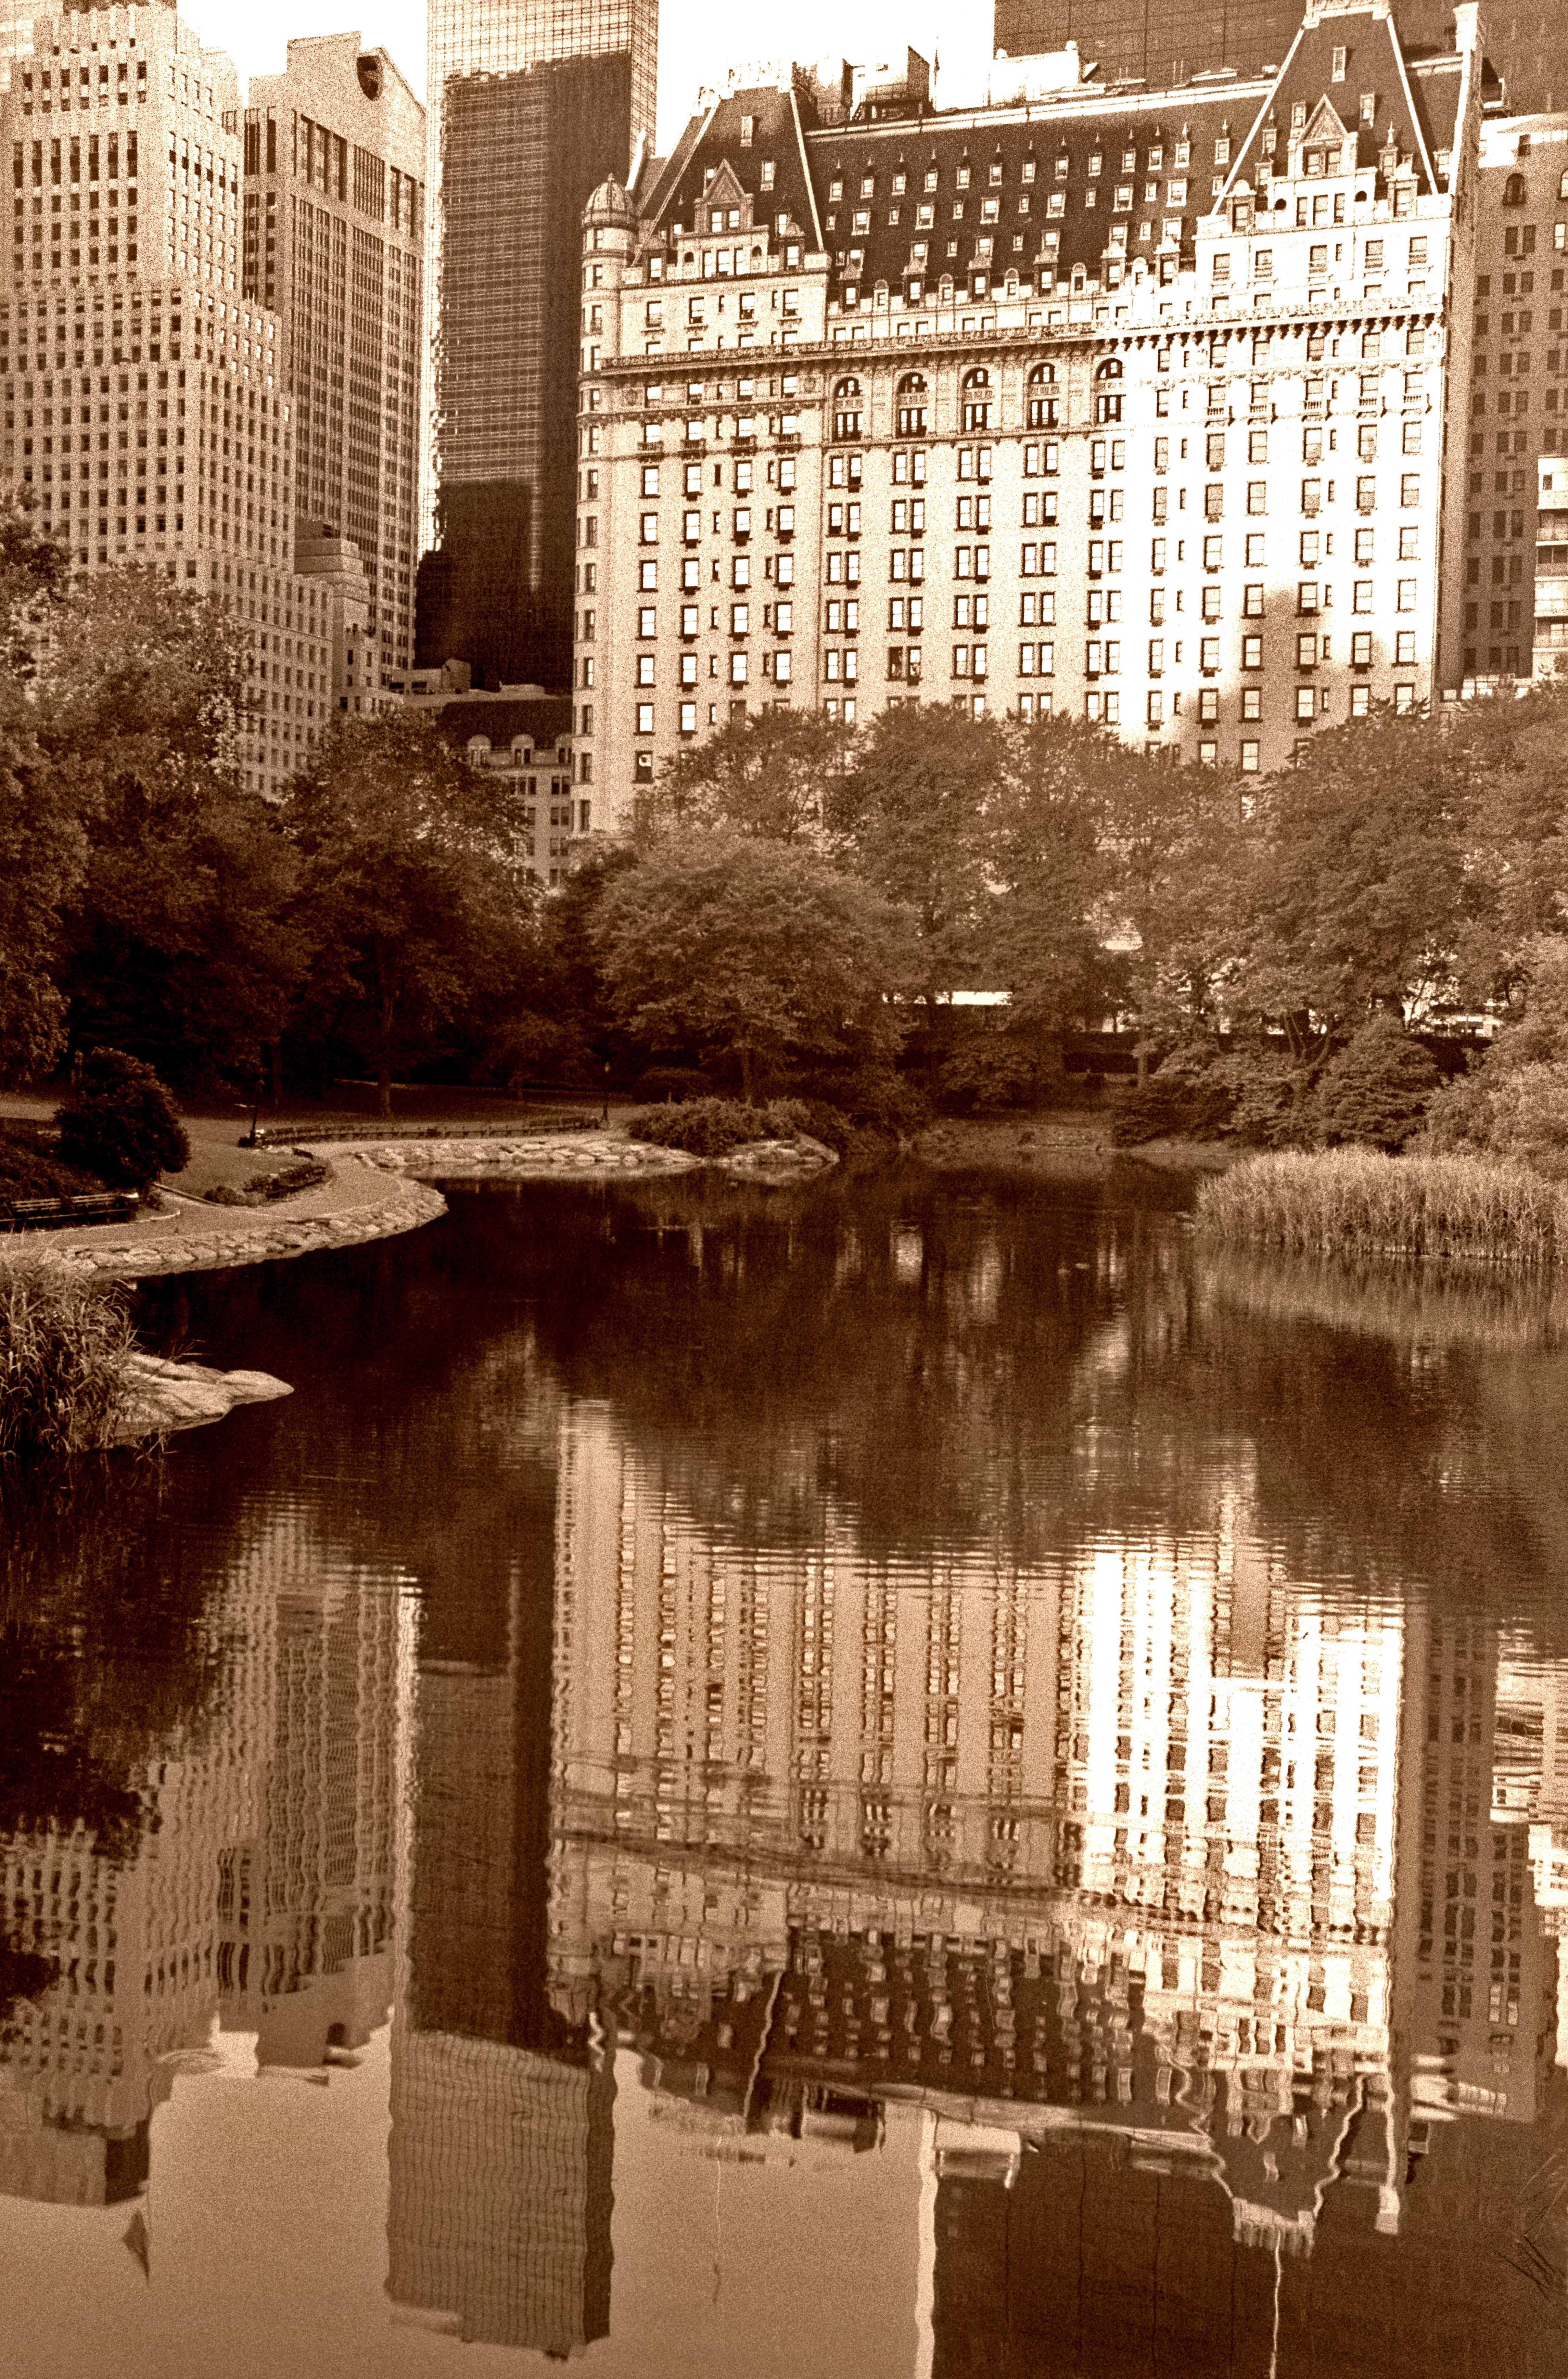 Plaza Hotel Reflection